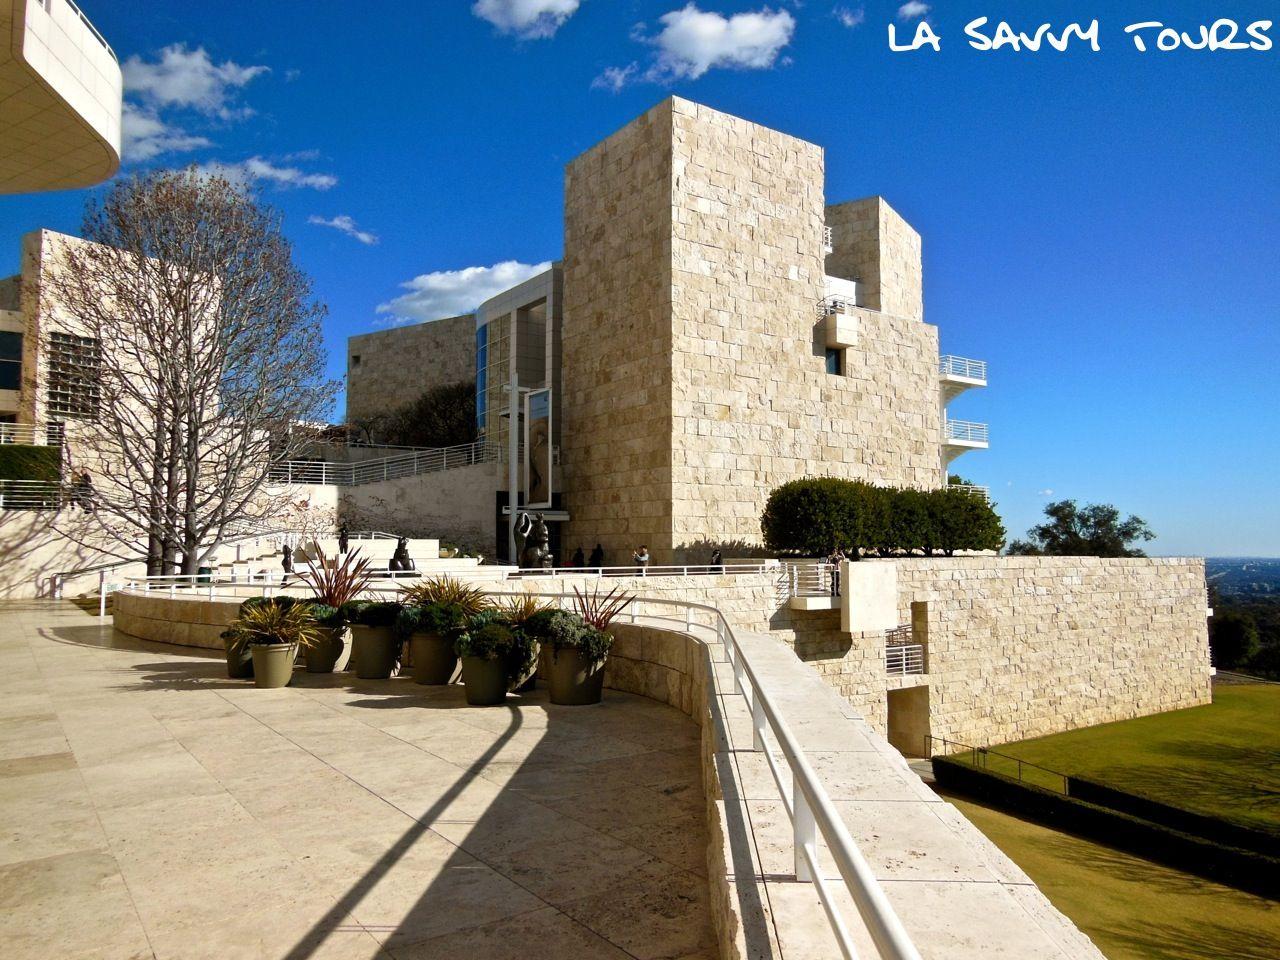 Paul Getty Museum Center Los Angeles California - Richard Meier And Robert